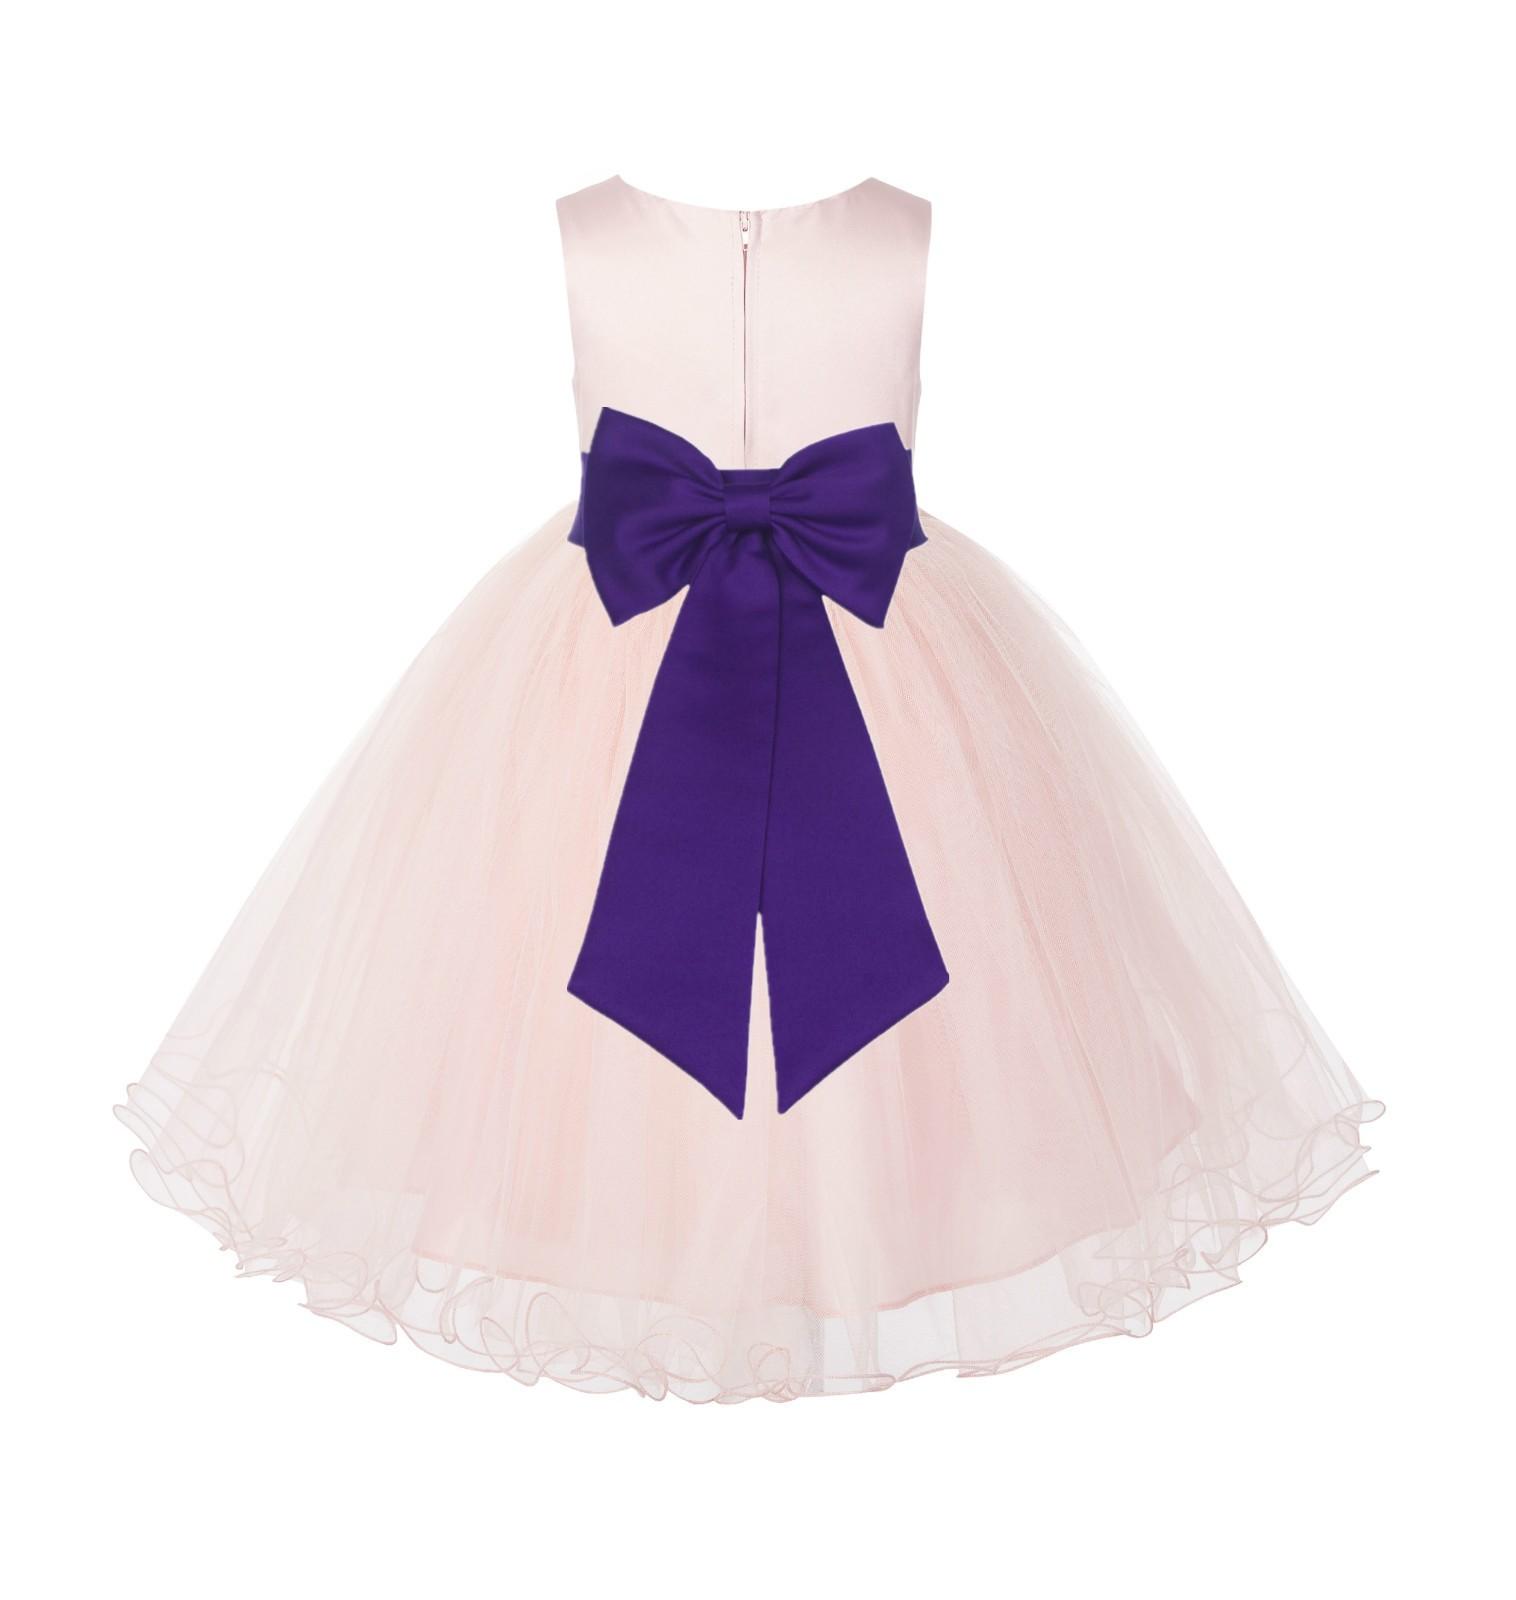 Blush PInk / Cadbury Tulle Rattail Edge Flower Girl Dress Wedding Bridesmaid 829T